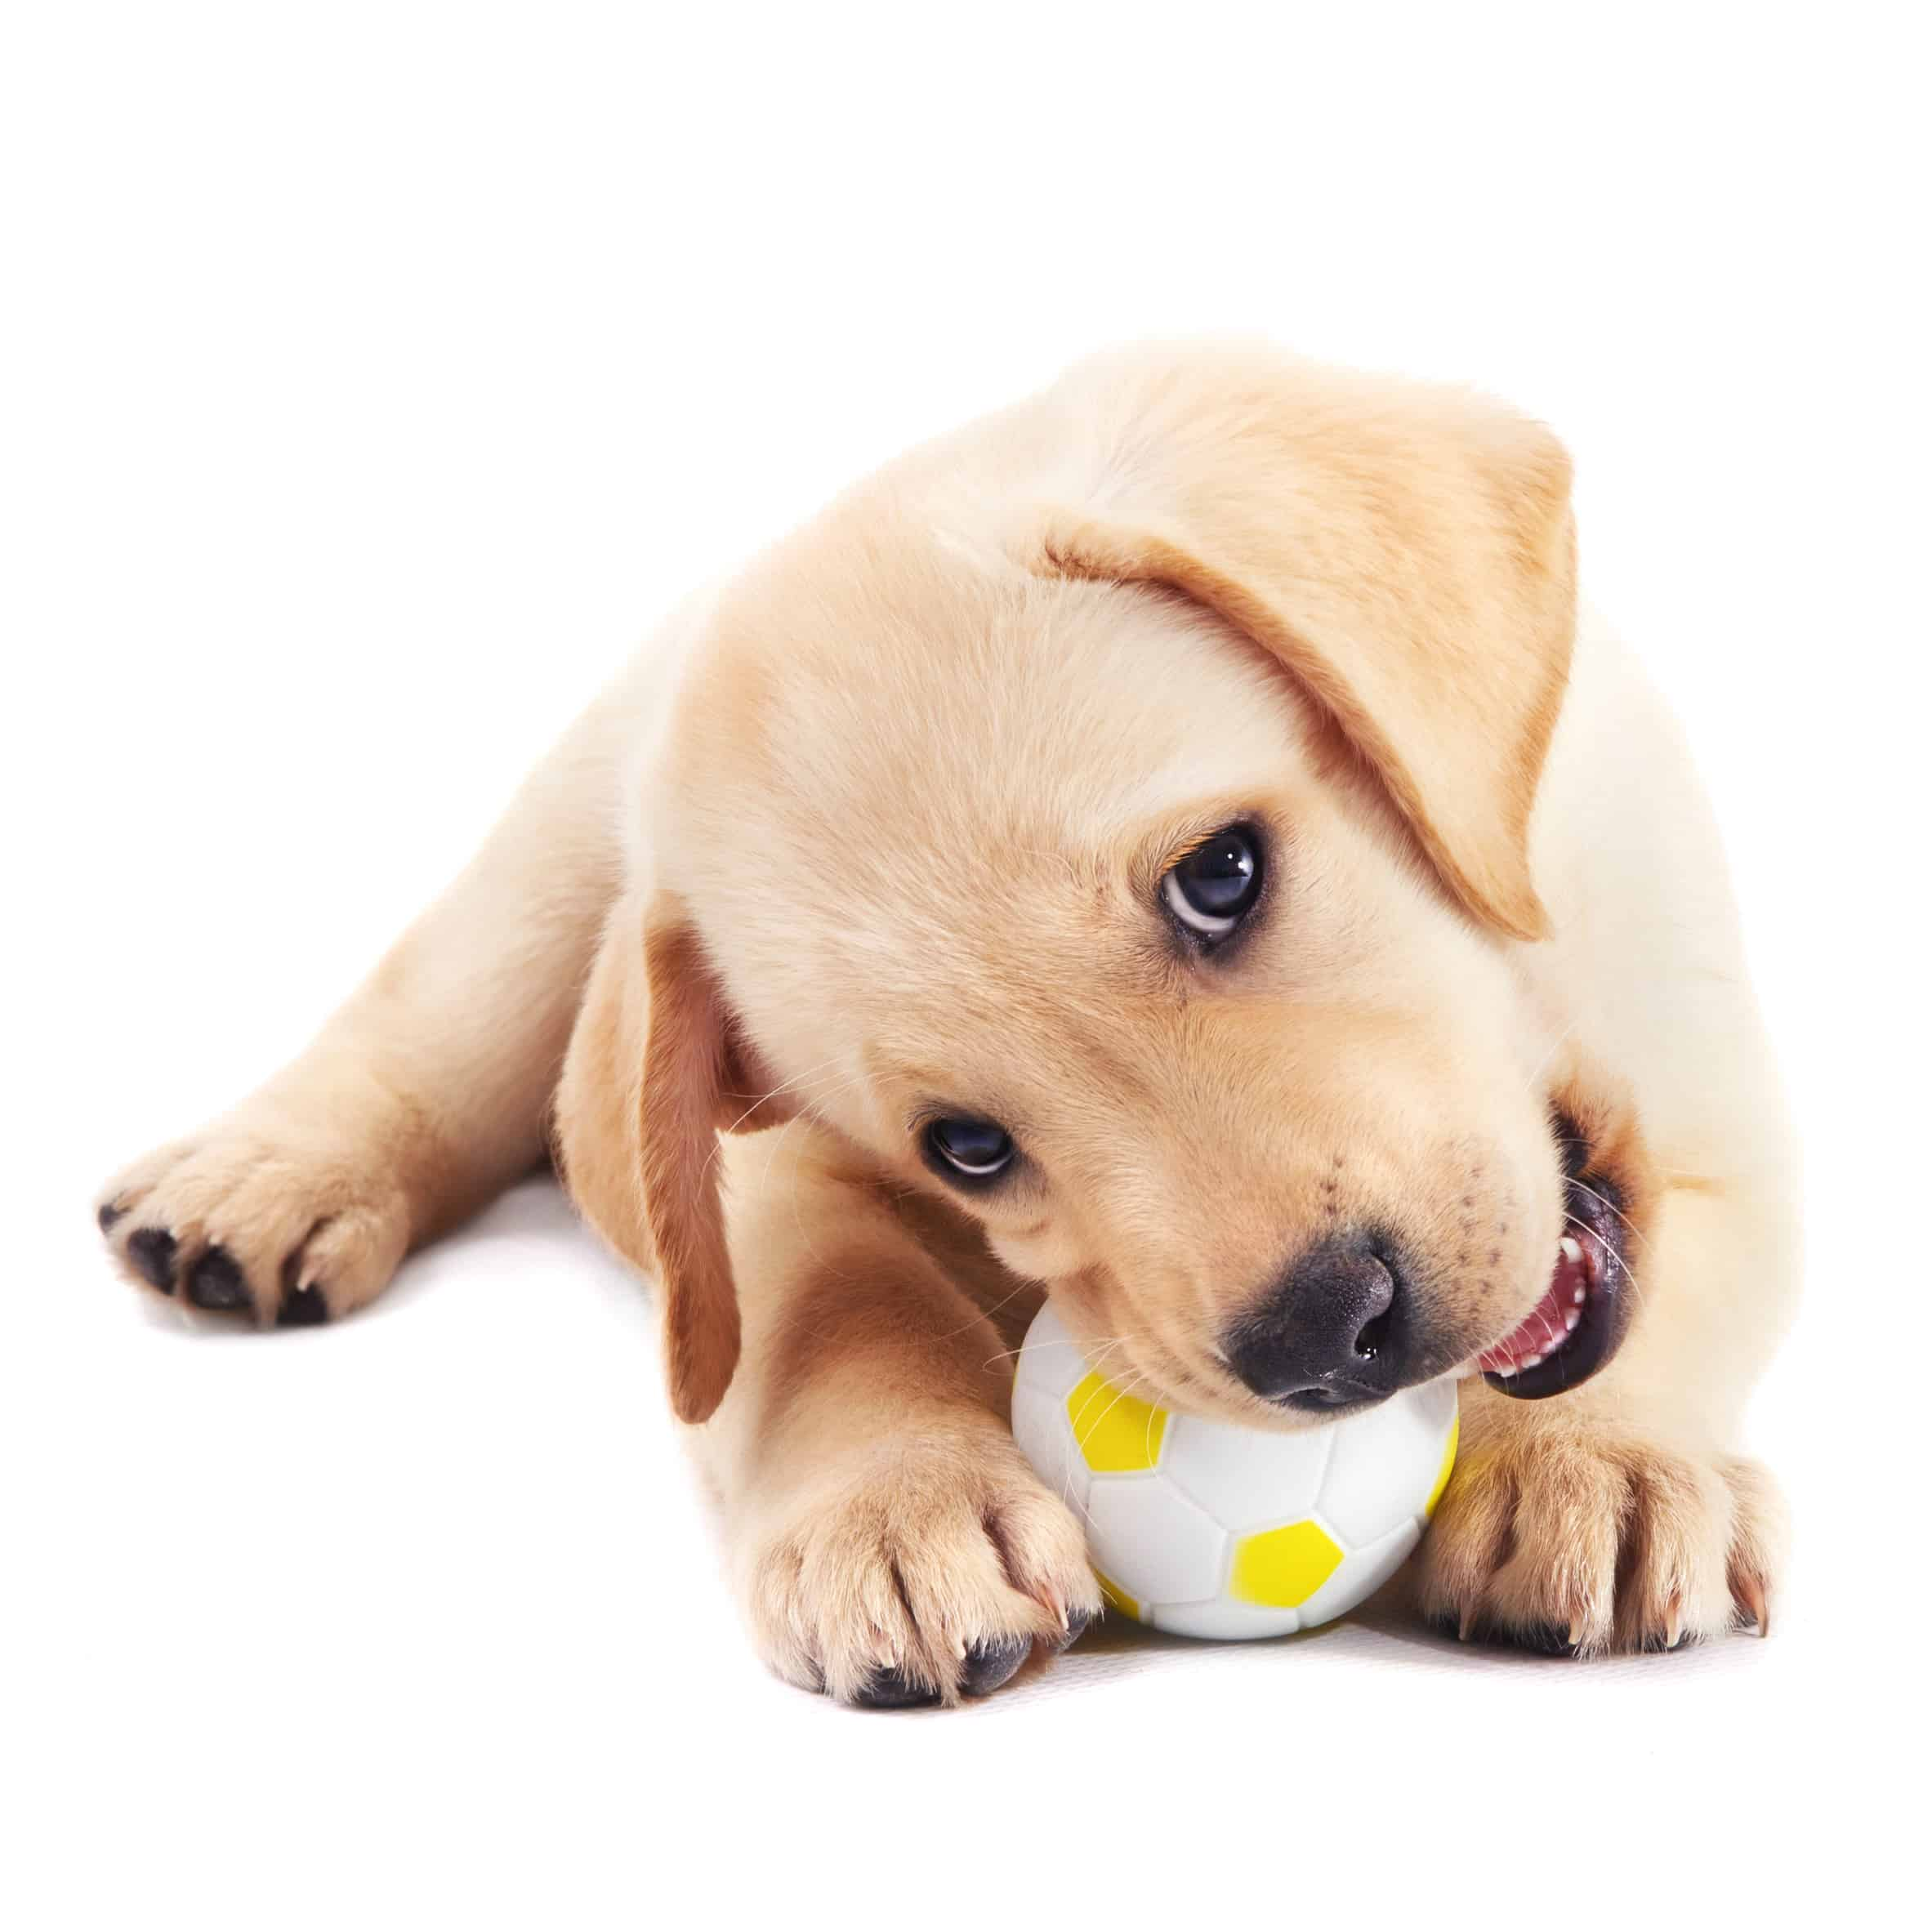 Best Puppy Food For Labs In 2020 Goodpuppyfood